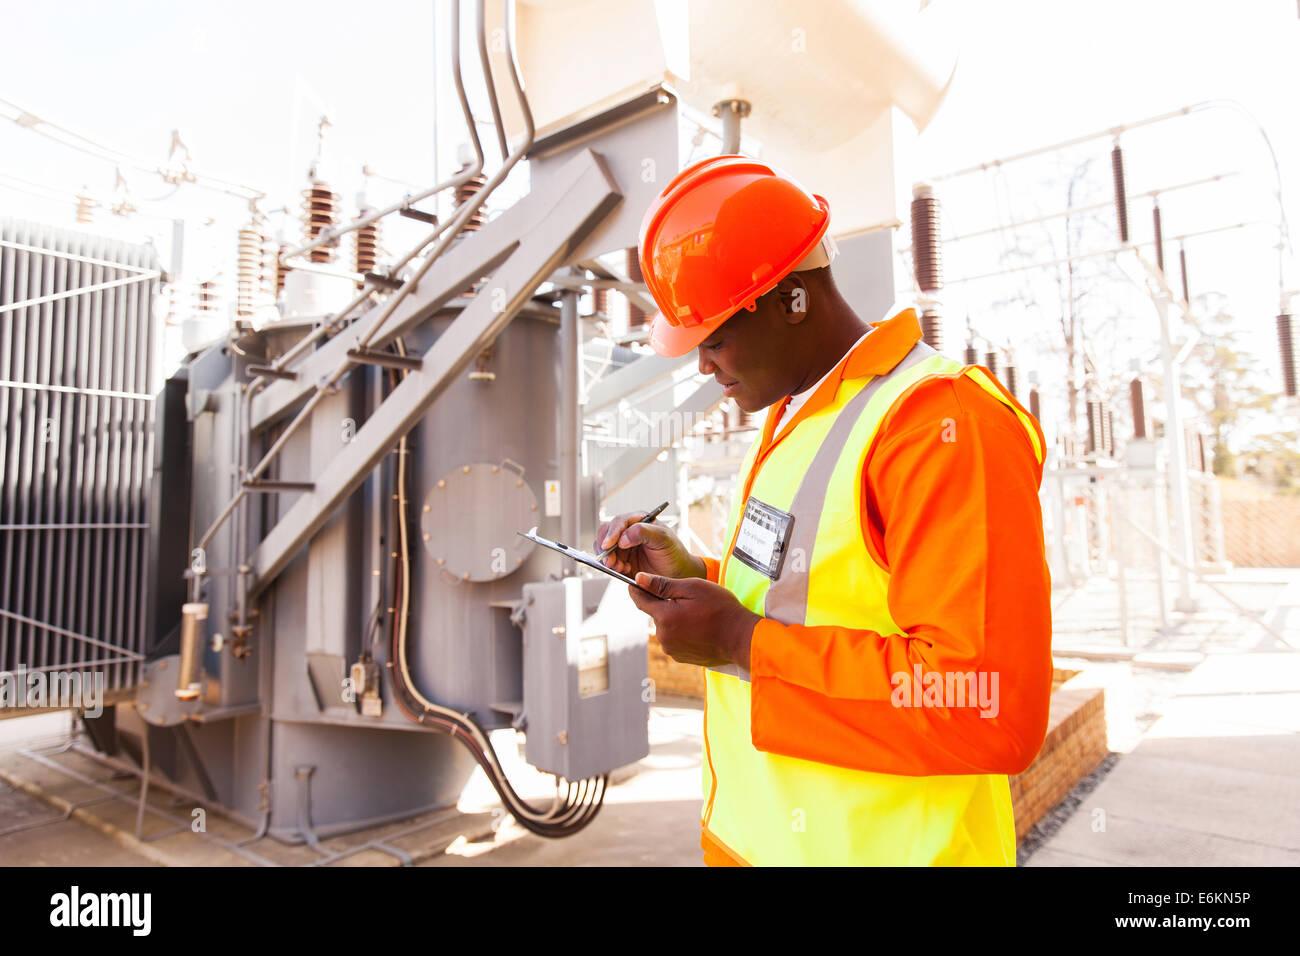 Beau ingénieur électrique african writing on clipboard in power plant Photo Stock